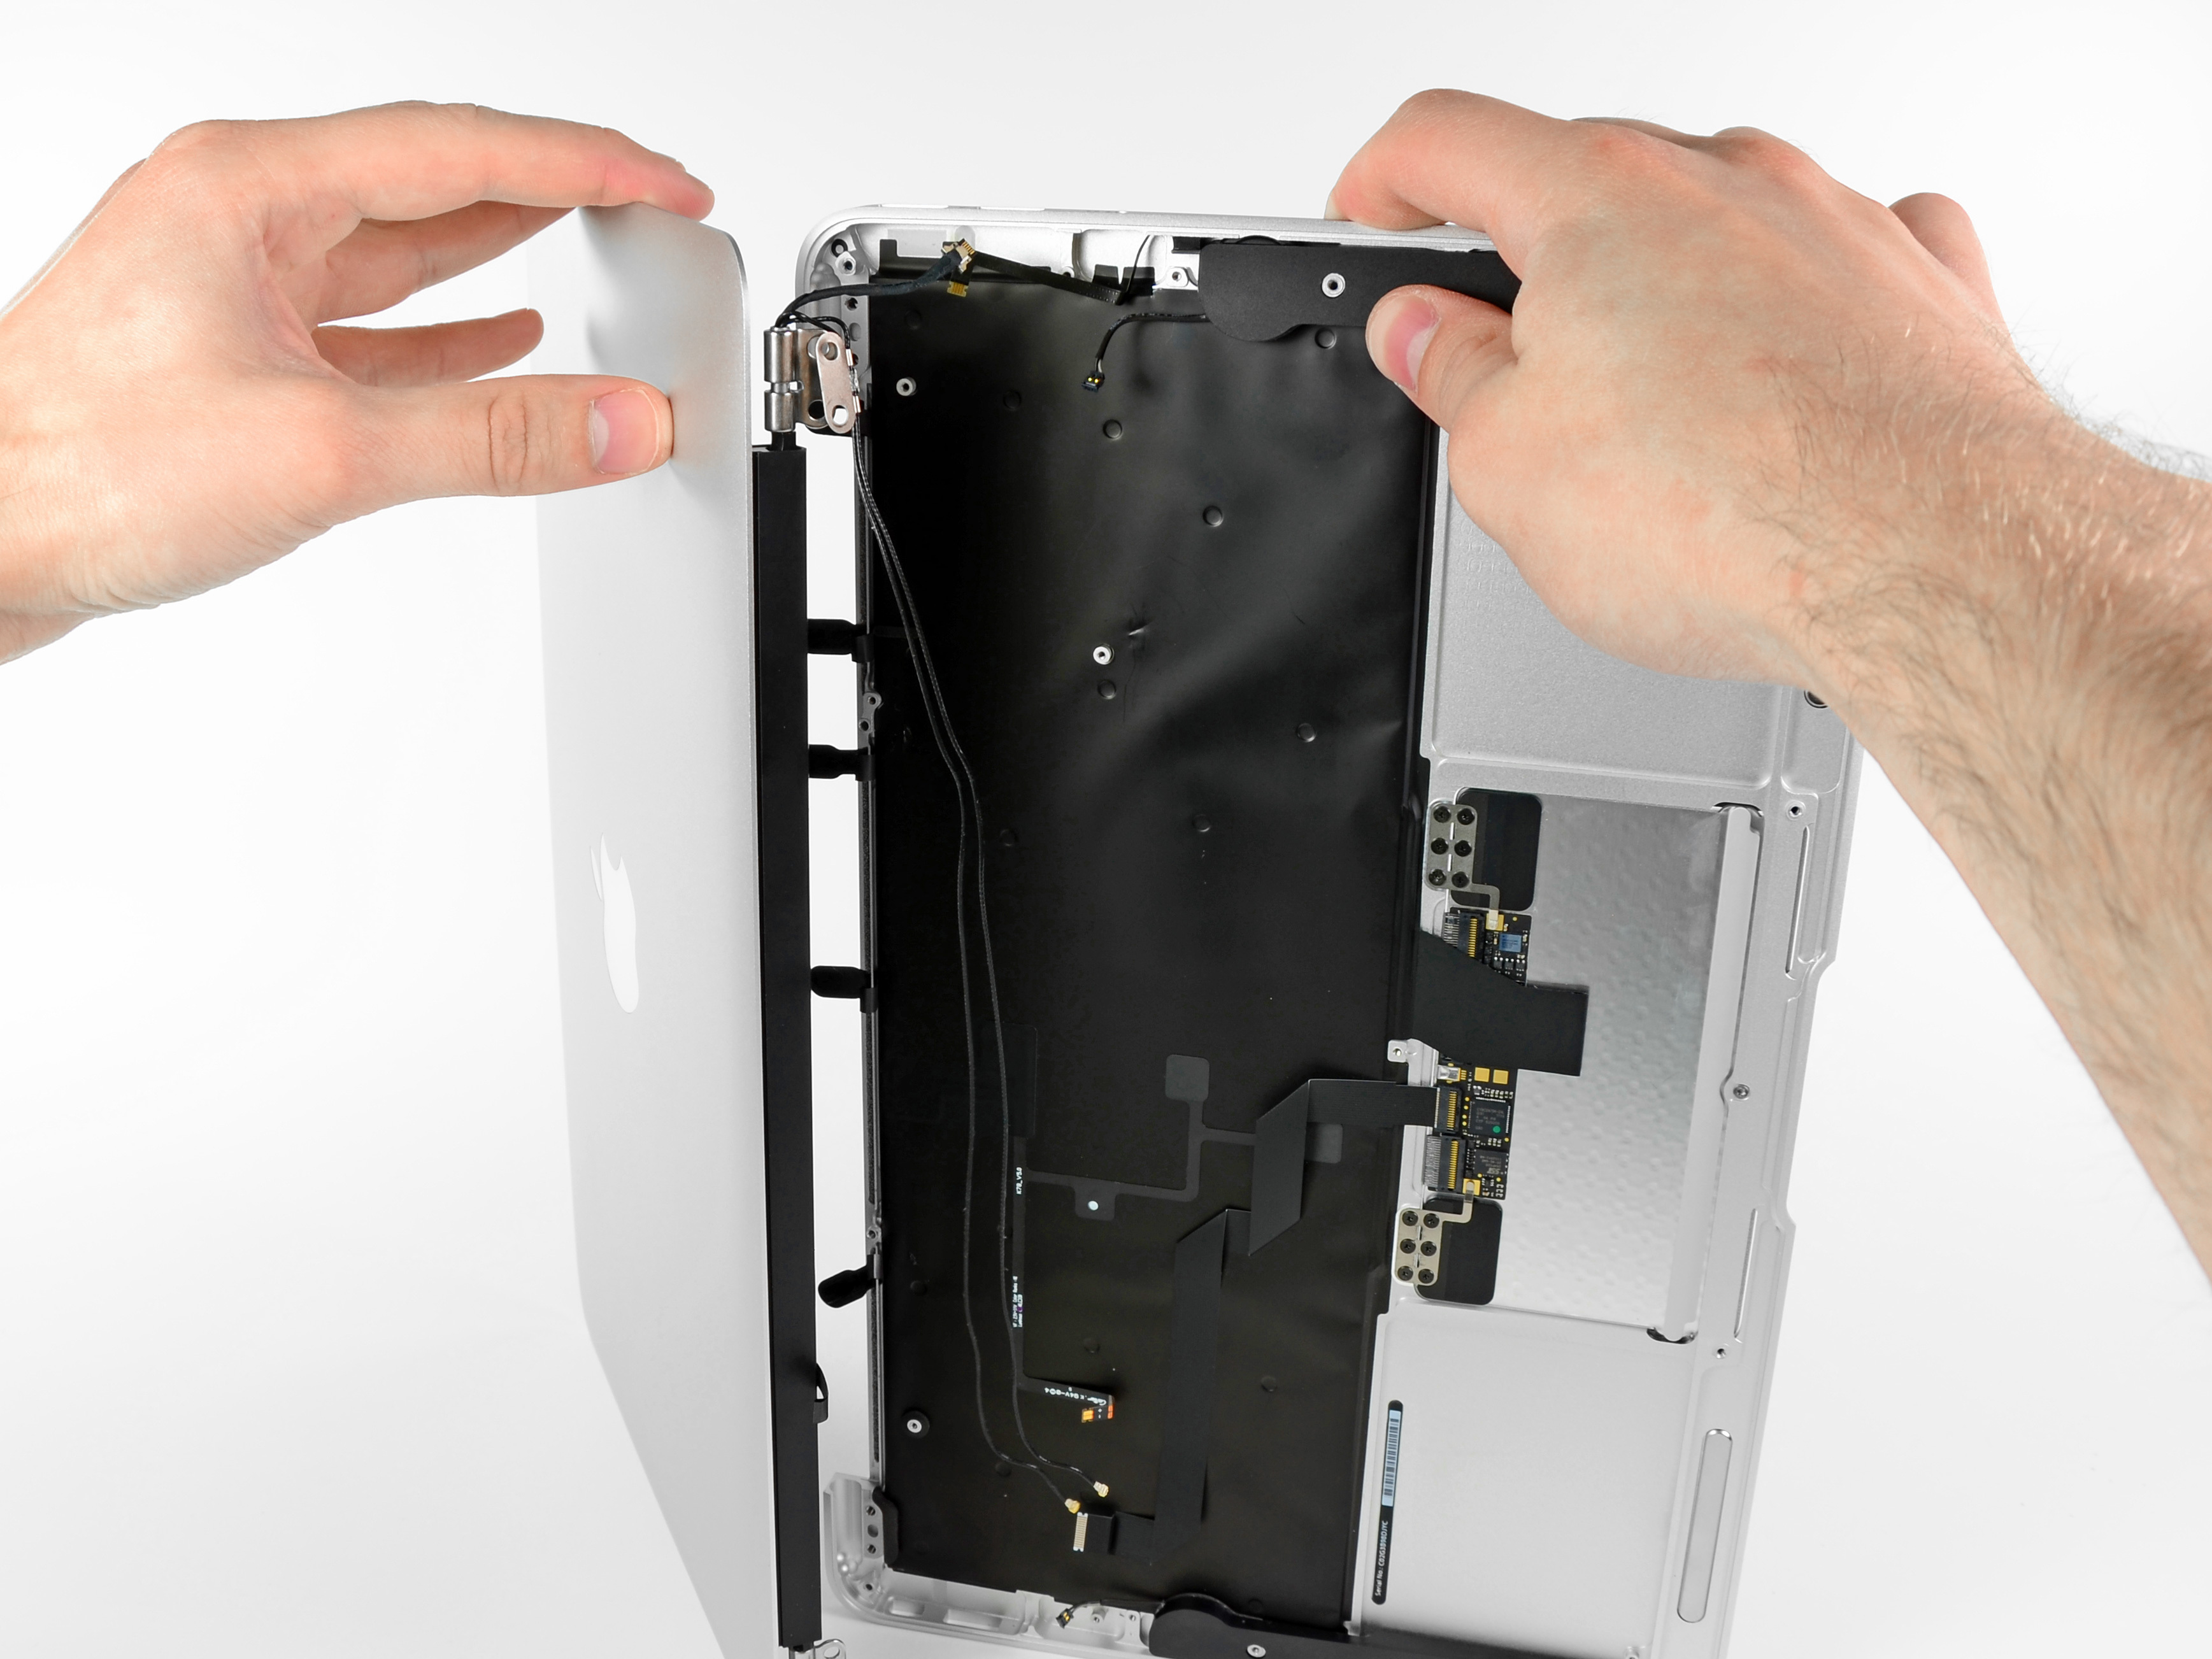 macbook air 11 mid 2012 repair ifixit rh ifixit com MacBook Pro Mid-2012 Ports Mid-2011-2012 MacBook Pro 13.3 Specs